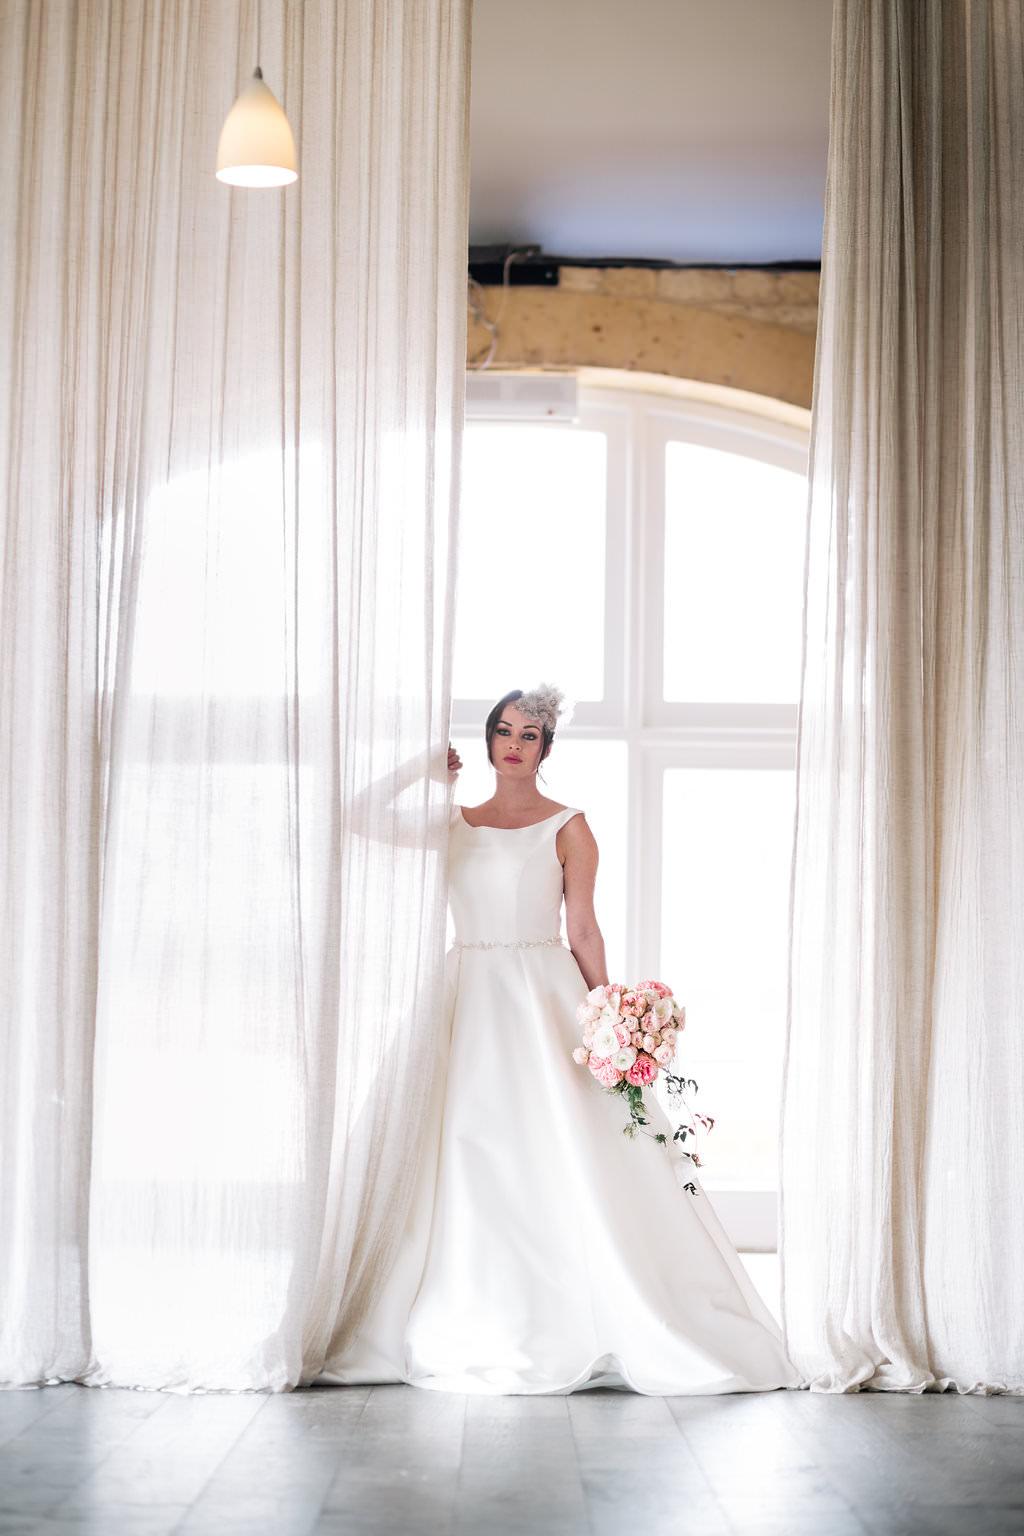 Dress Gown Bride Bridal Classic Lapstone Barn Wedding Ideas Cotswolds Katie Hamilton Photography